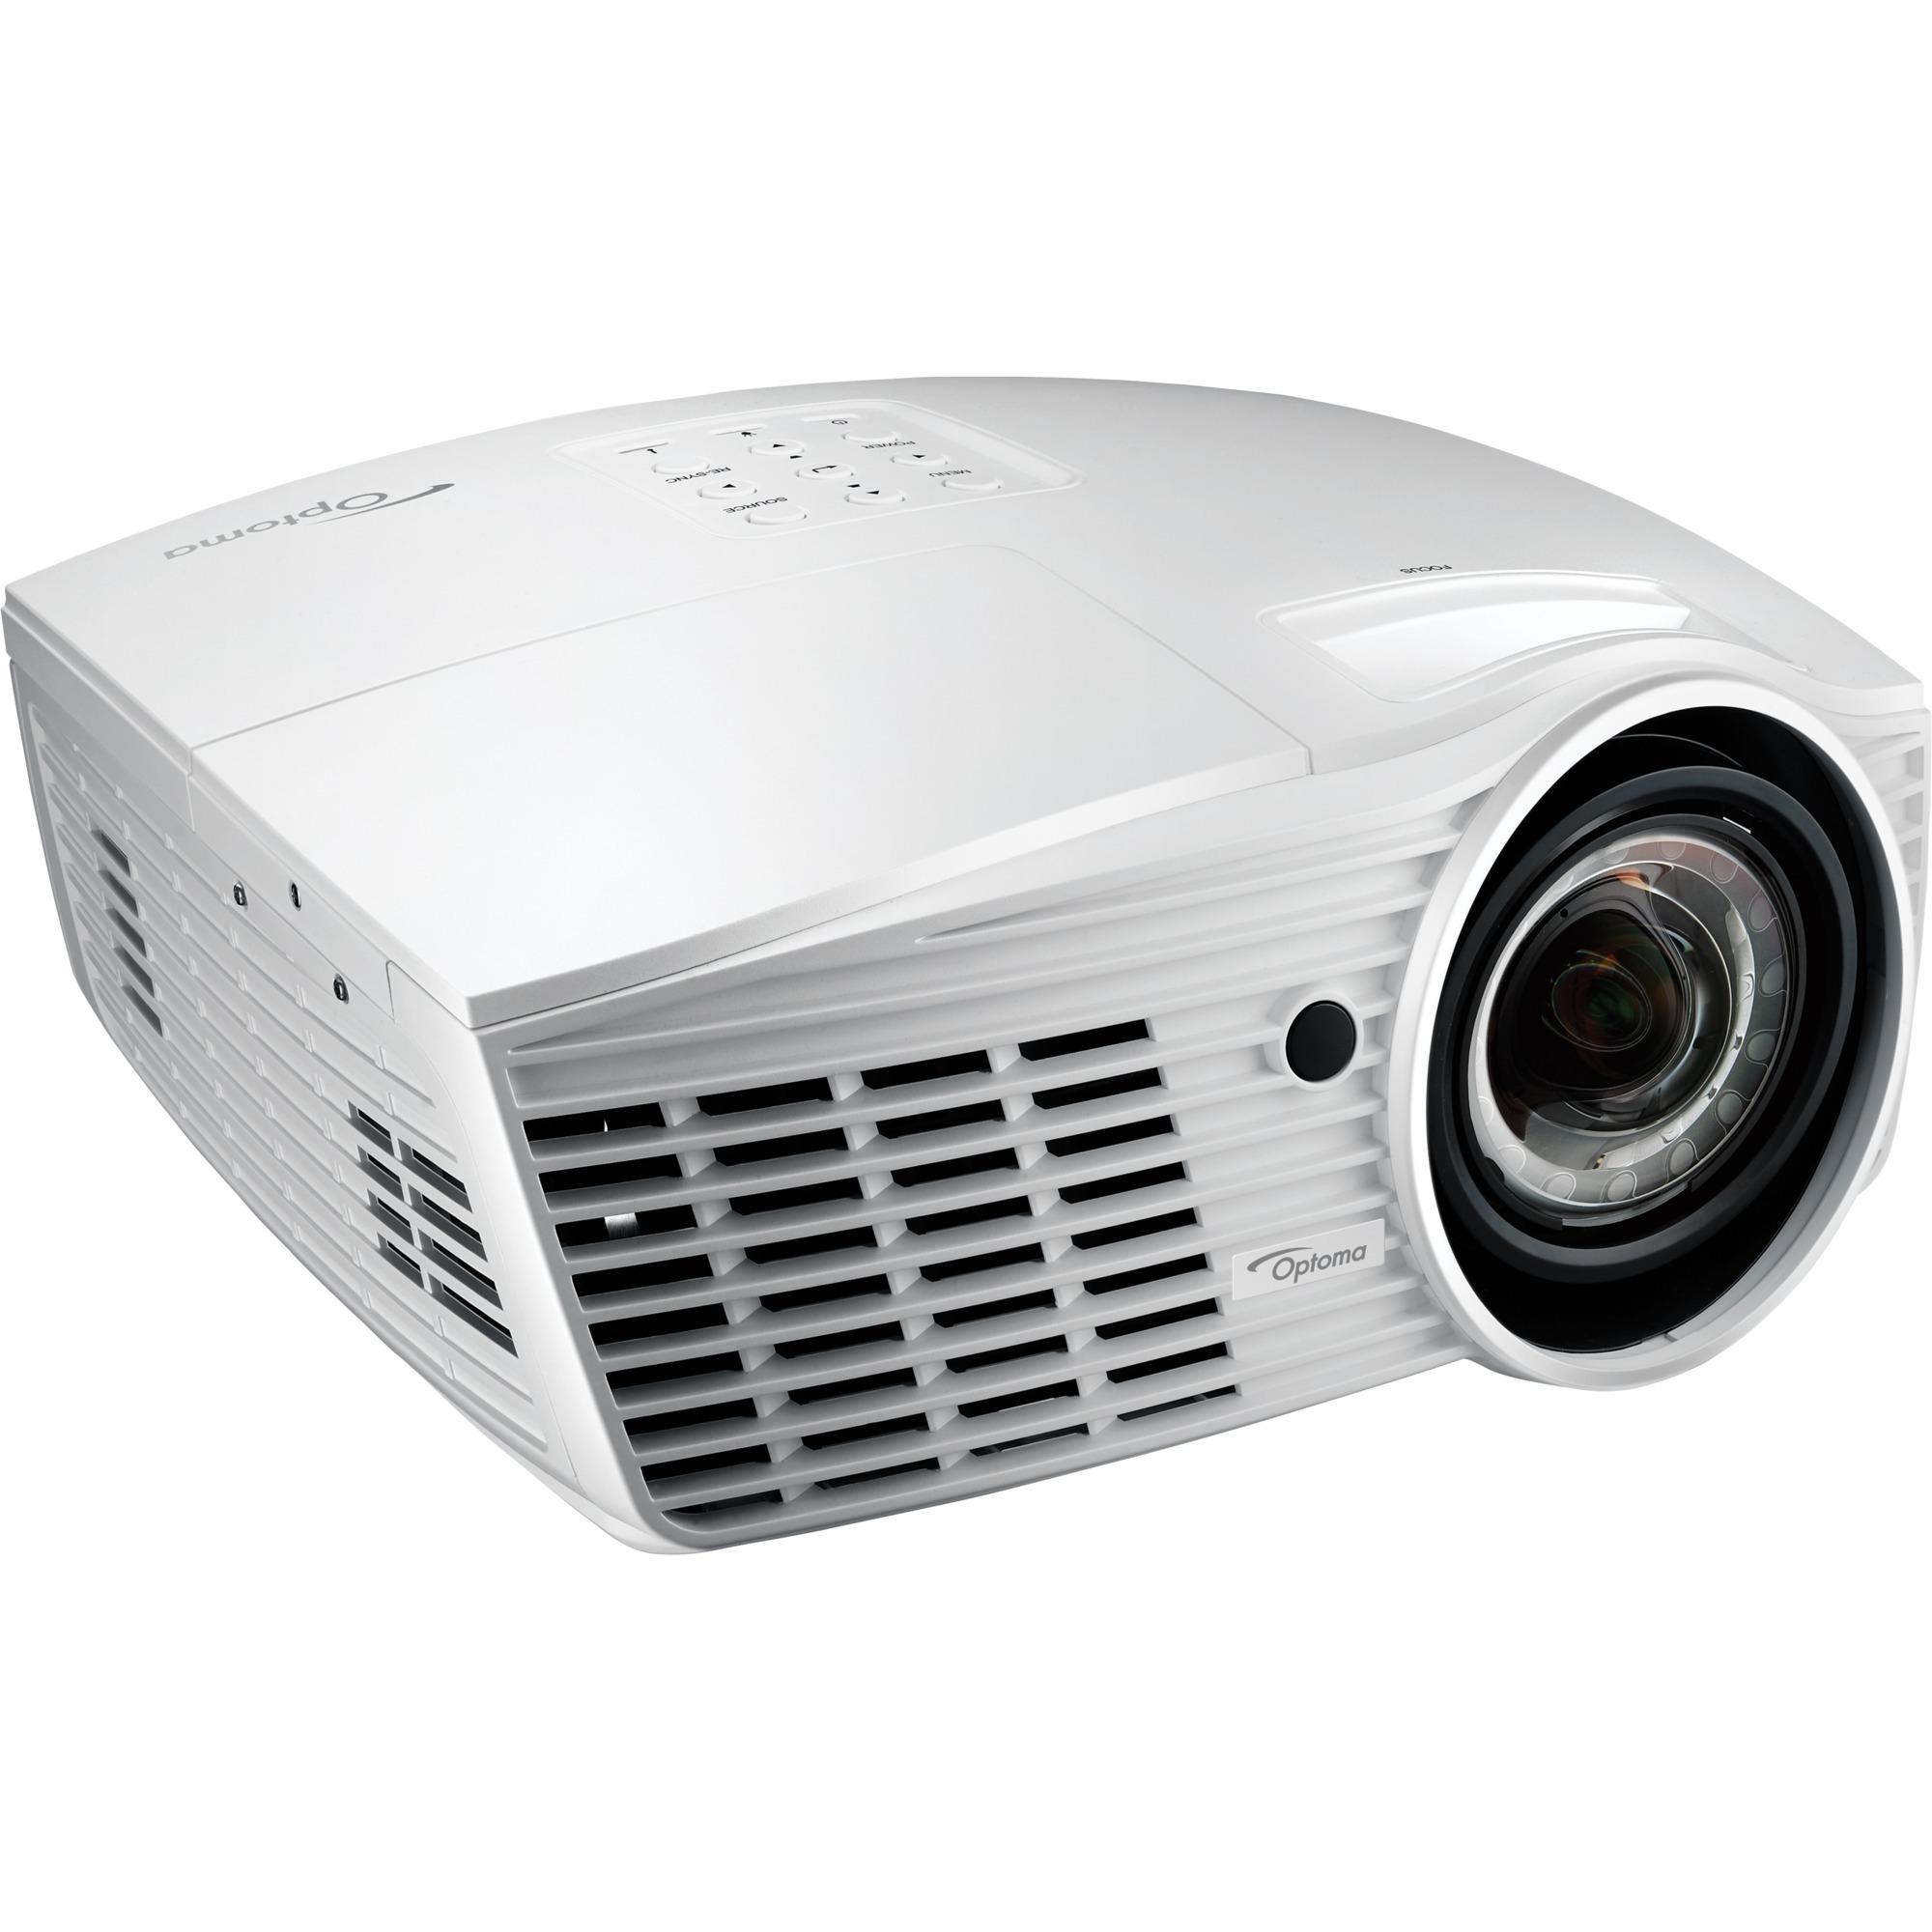 EH415ST videoproyector 3500 lúmenes ANSI DLP 1080p (1920x1080) 3D Proyector para escritorio Blanco, Proyector DLP